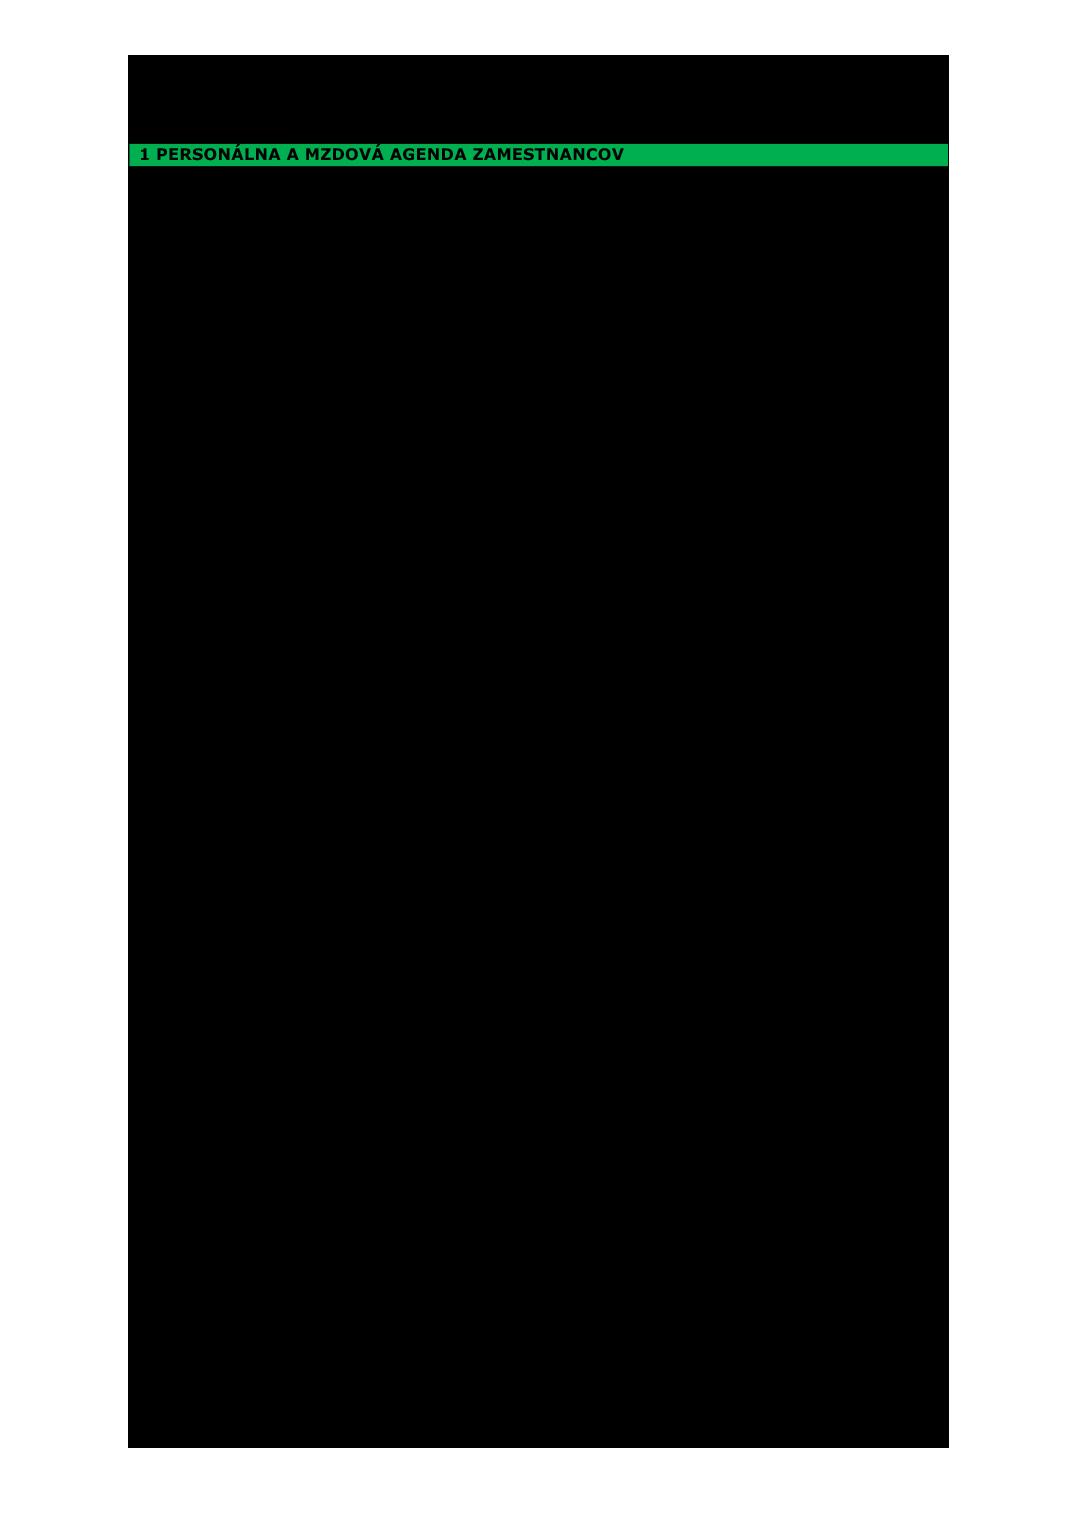 inpo-03